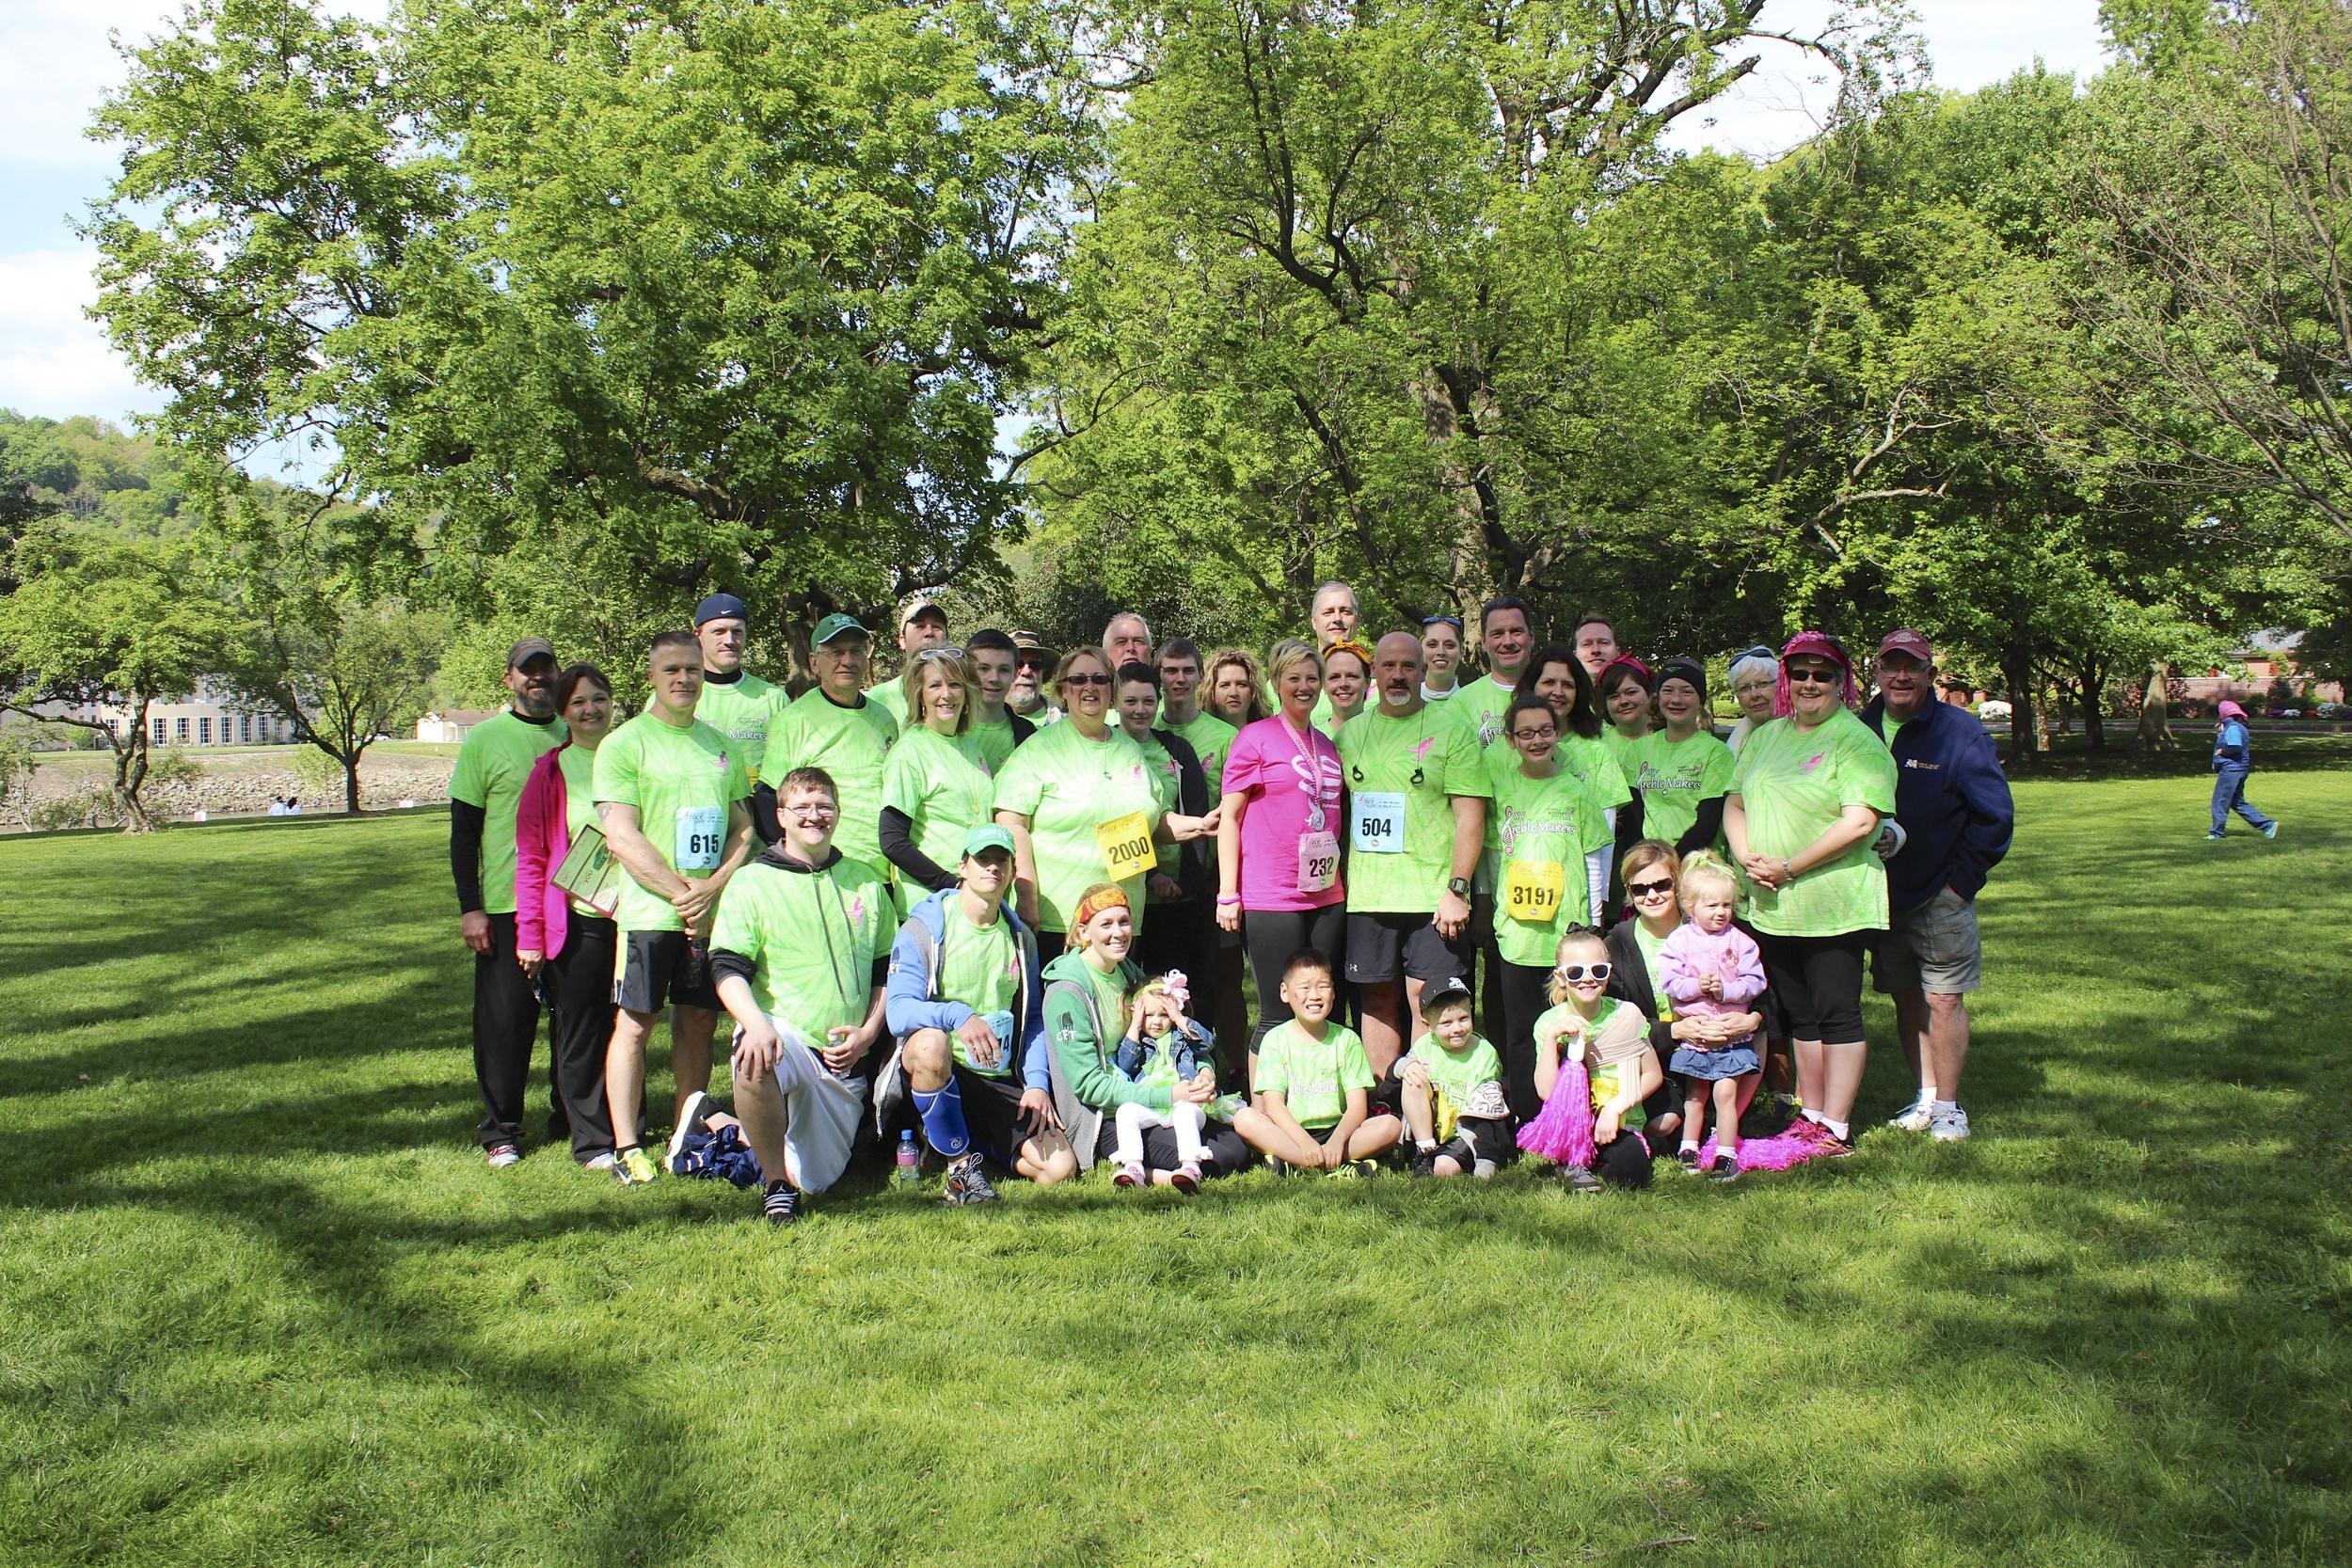 Race for the Cure: Team Stefanie, 5/3/14